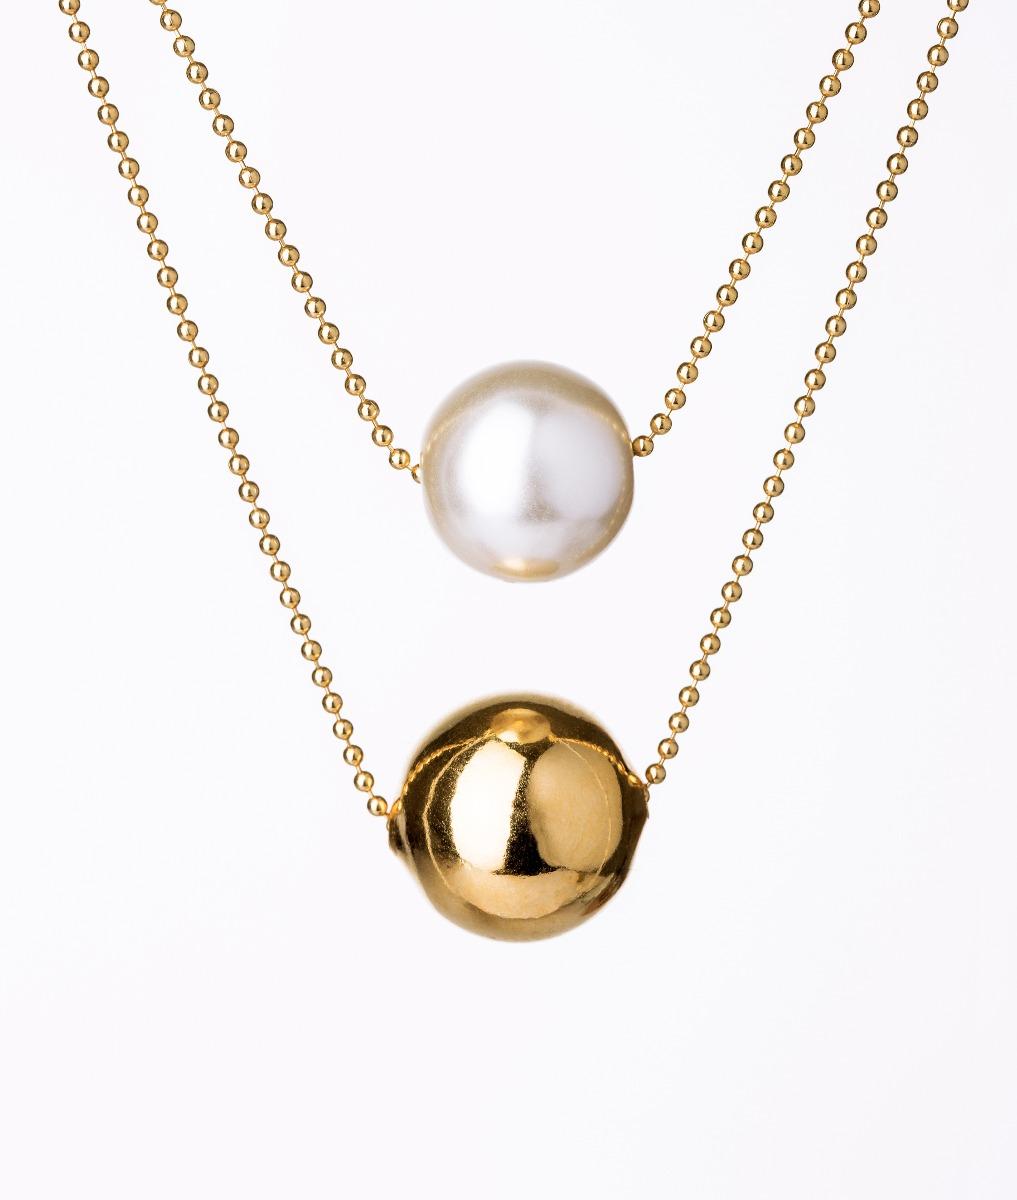 Collar van grieken bola perla blanca dorado ba o de oro - Bano de oro precio ...